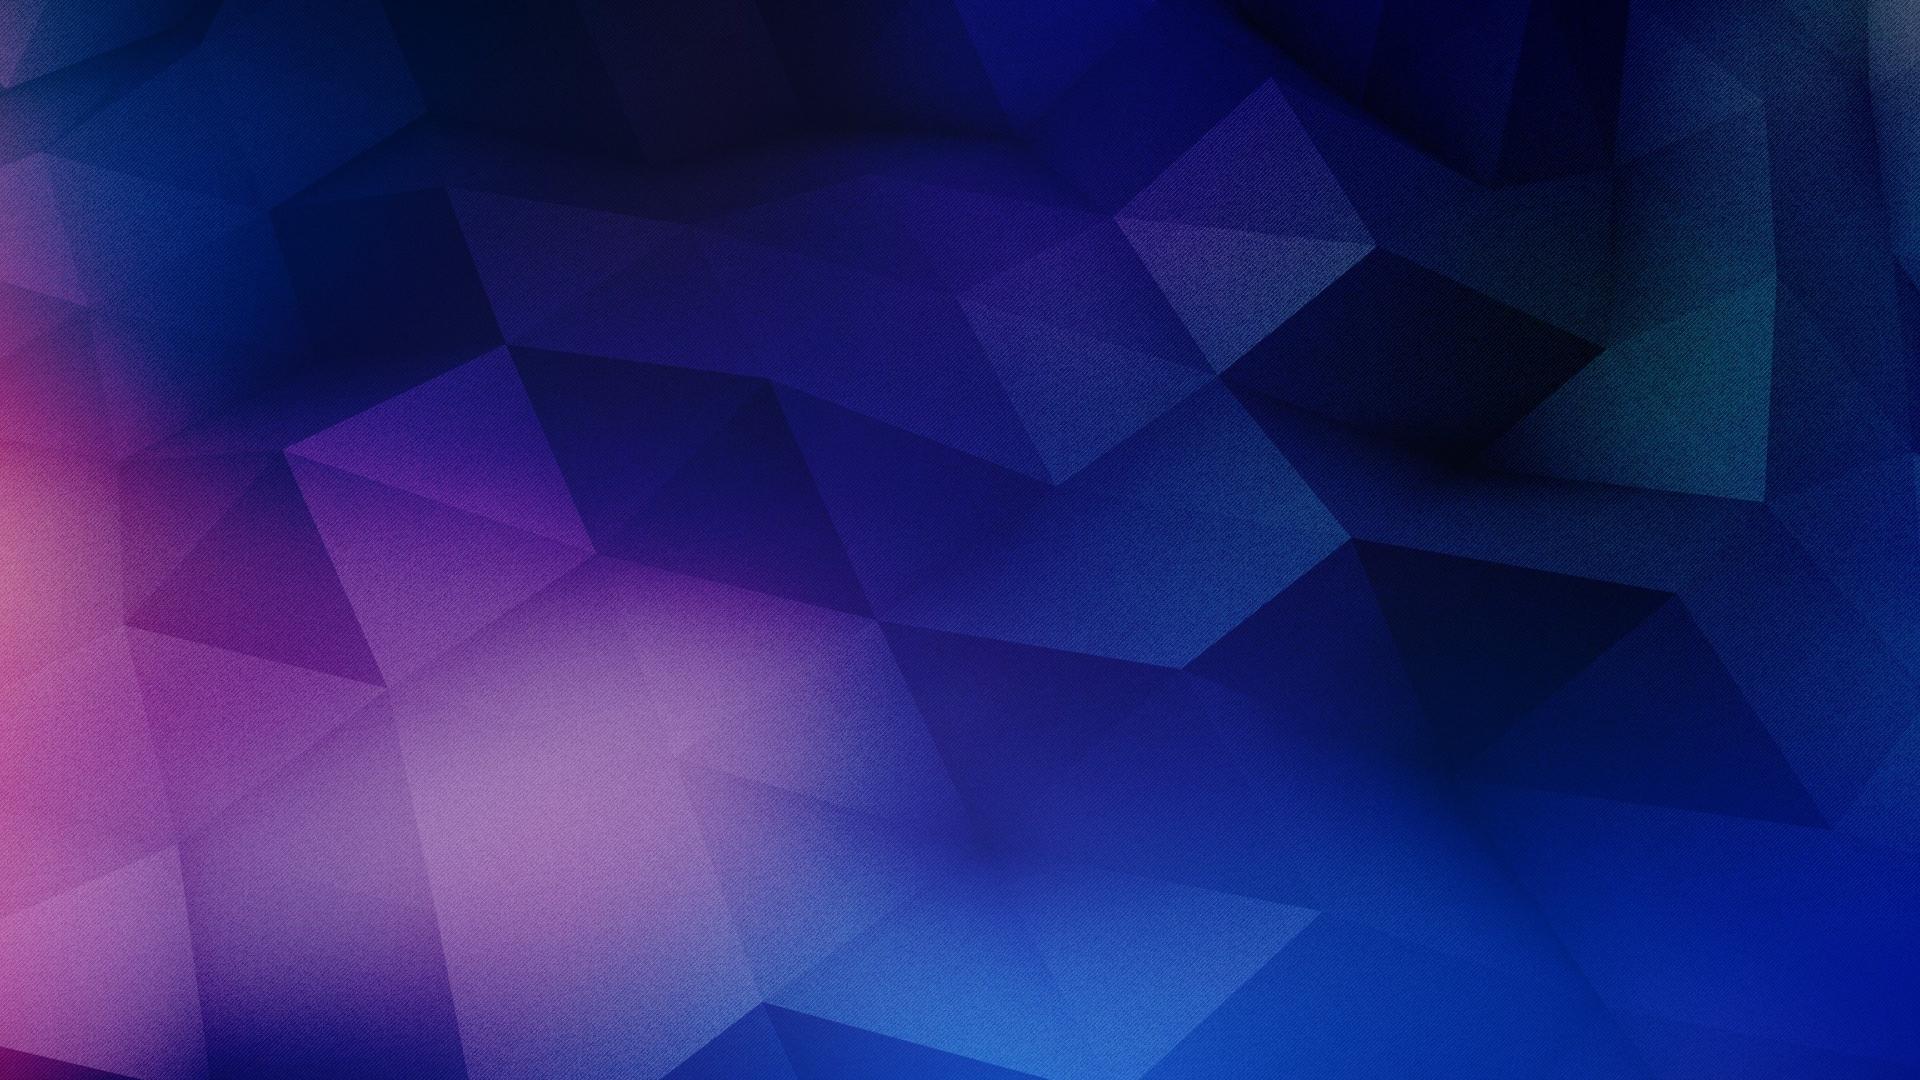 download Geometric wallpapers purple shapes blue wallpaper 1920x1080